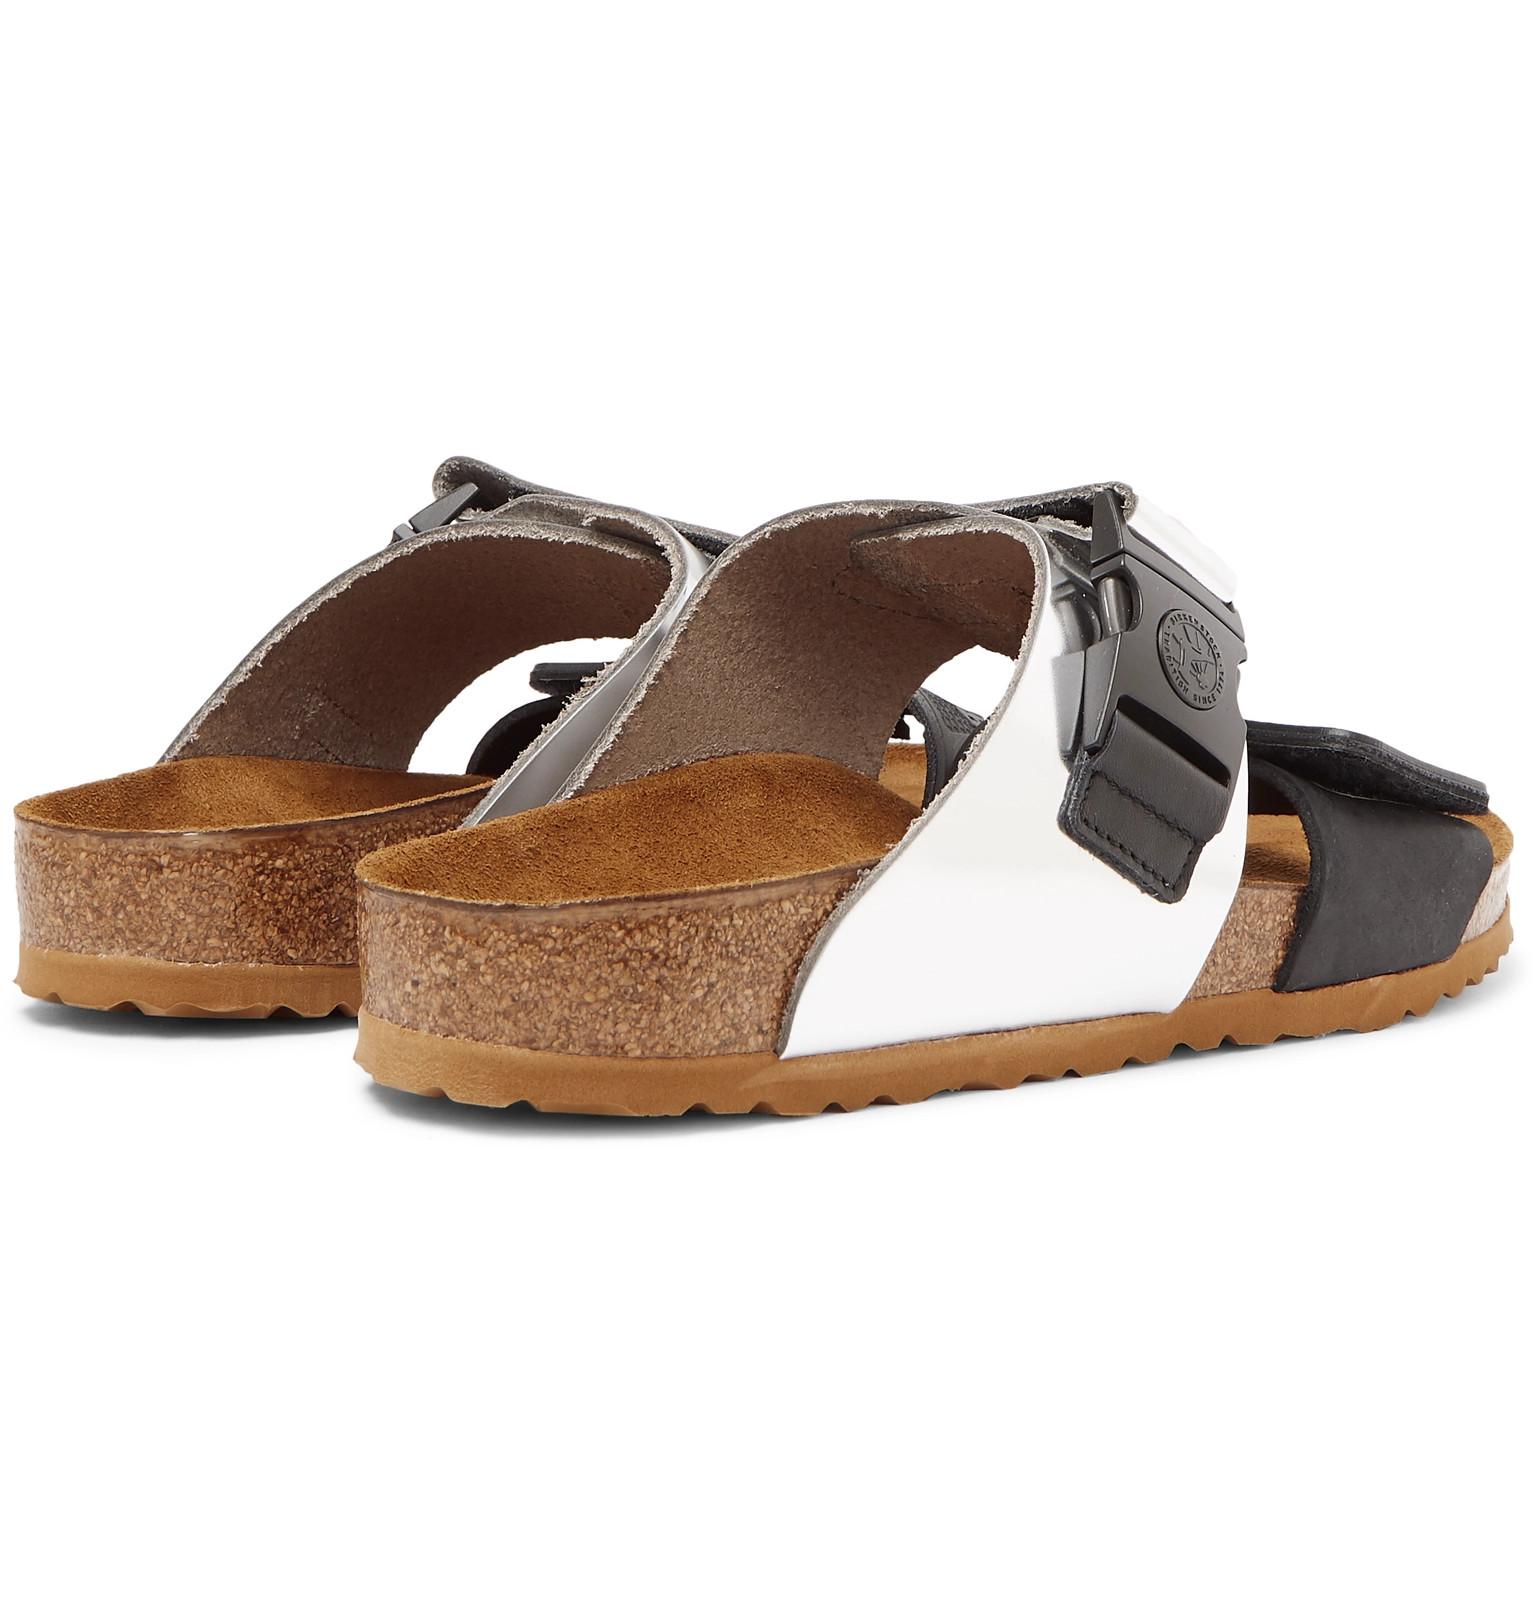 9d3d083811a5 Rick Owens - + Birkenstock Rotterdam Metallic Leather and Rubber Sandals